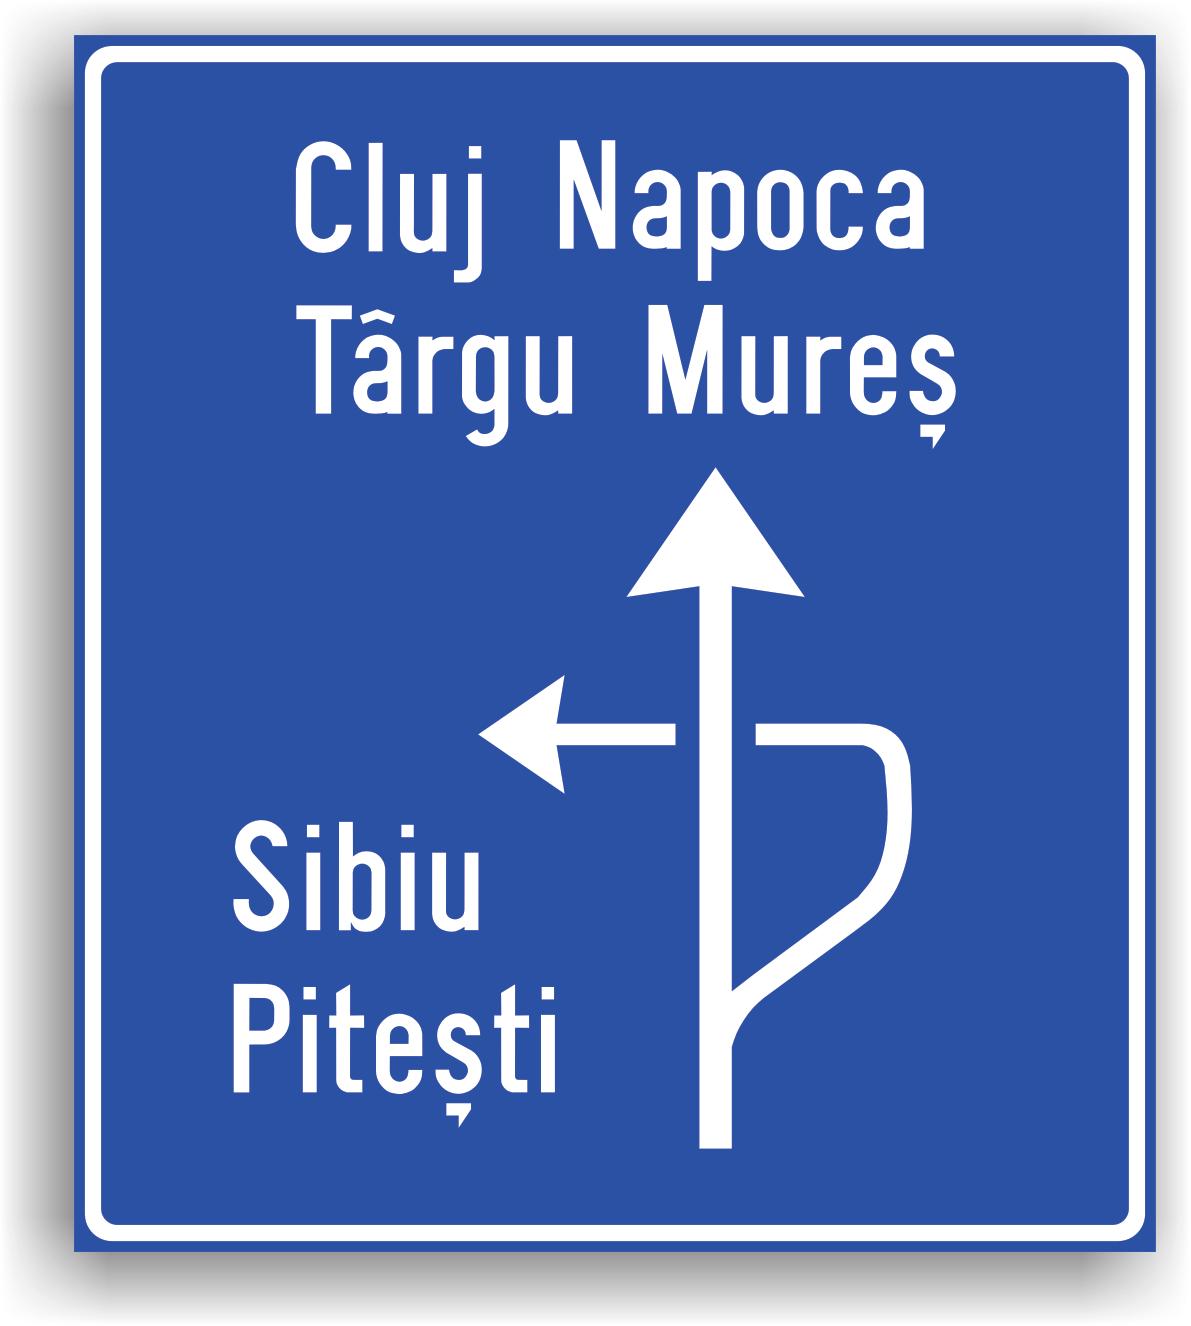 In localitate se amplaseaza la 50-100 m de intersectia denivelata de drumuri, iar in afara localitatii la 100-200 m. In general, se instaleaza la intersectii de drumuri judetene, nationale sau la intersectii de drumuri nationale cu drumuri judetene.